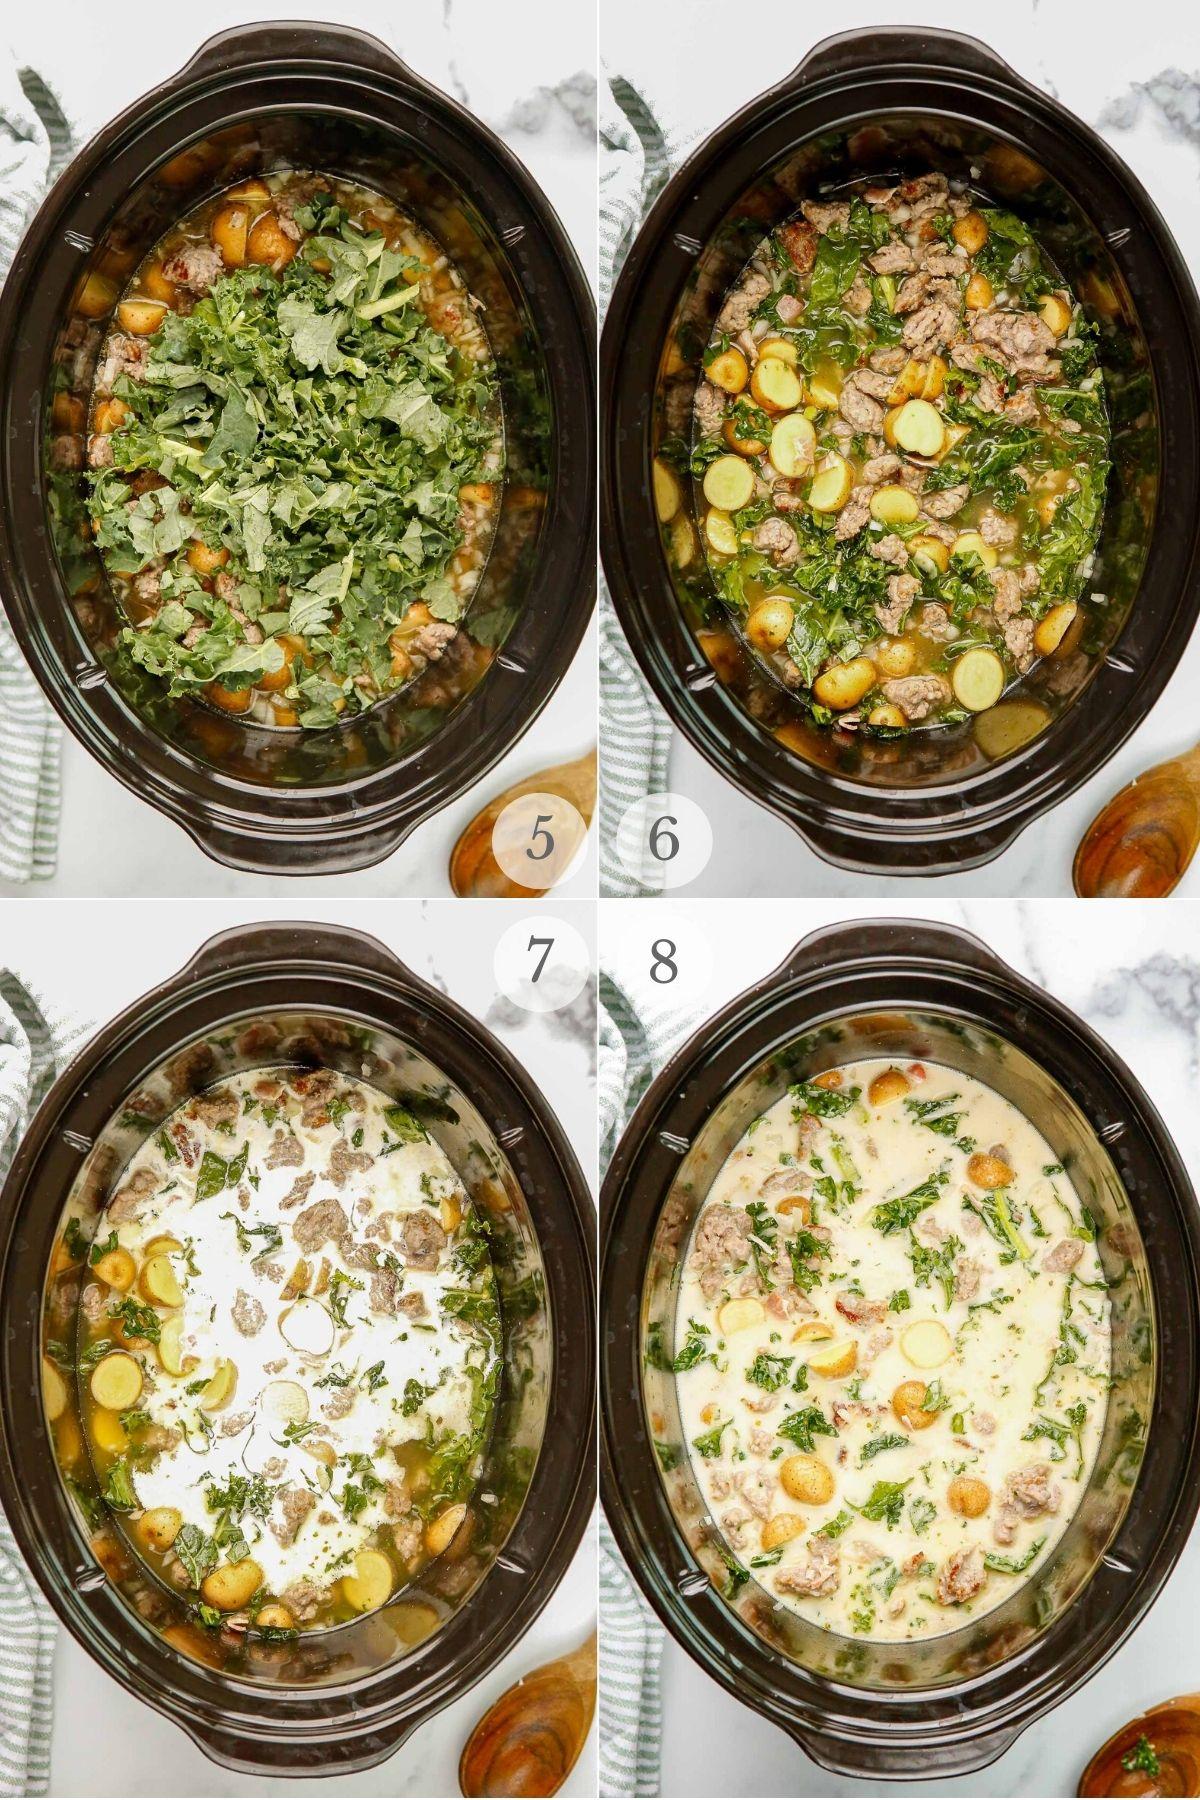 Zuppa Toscana recipe steps 5-8